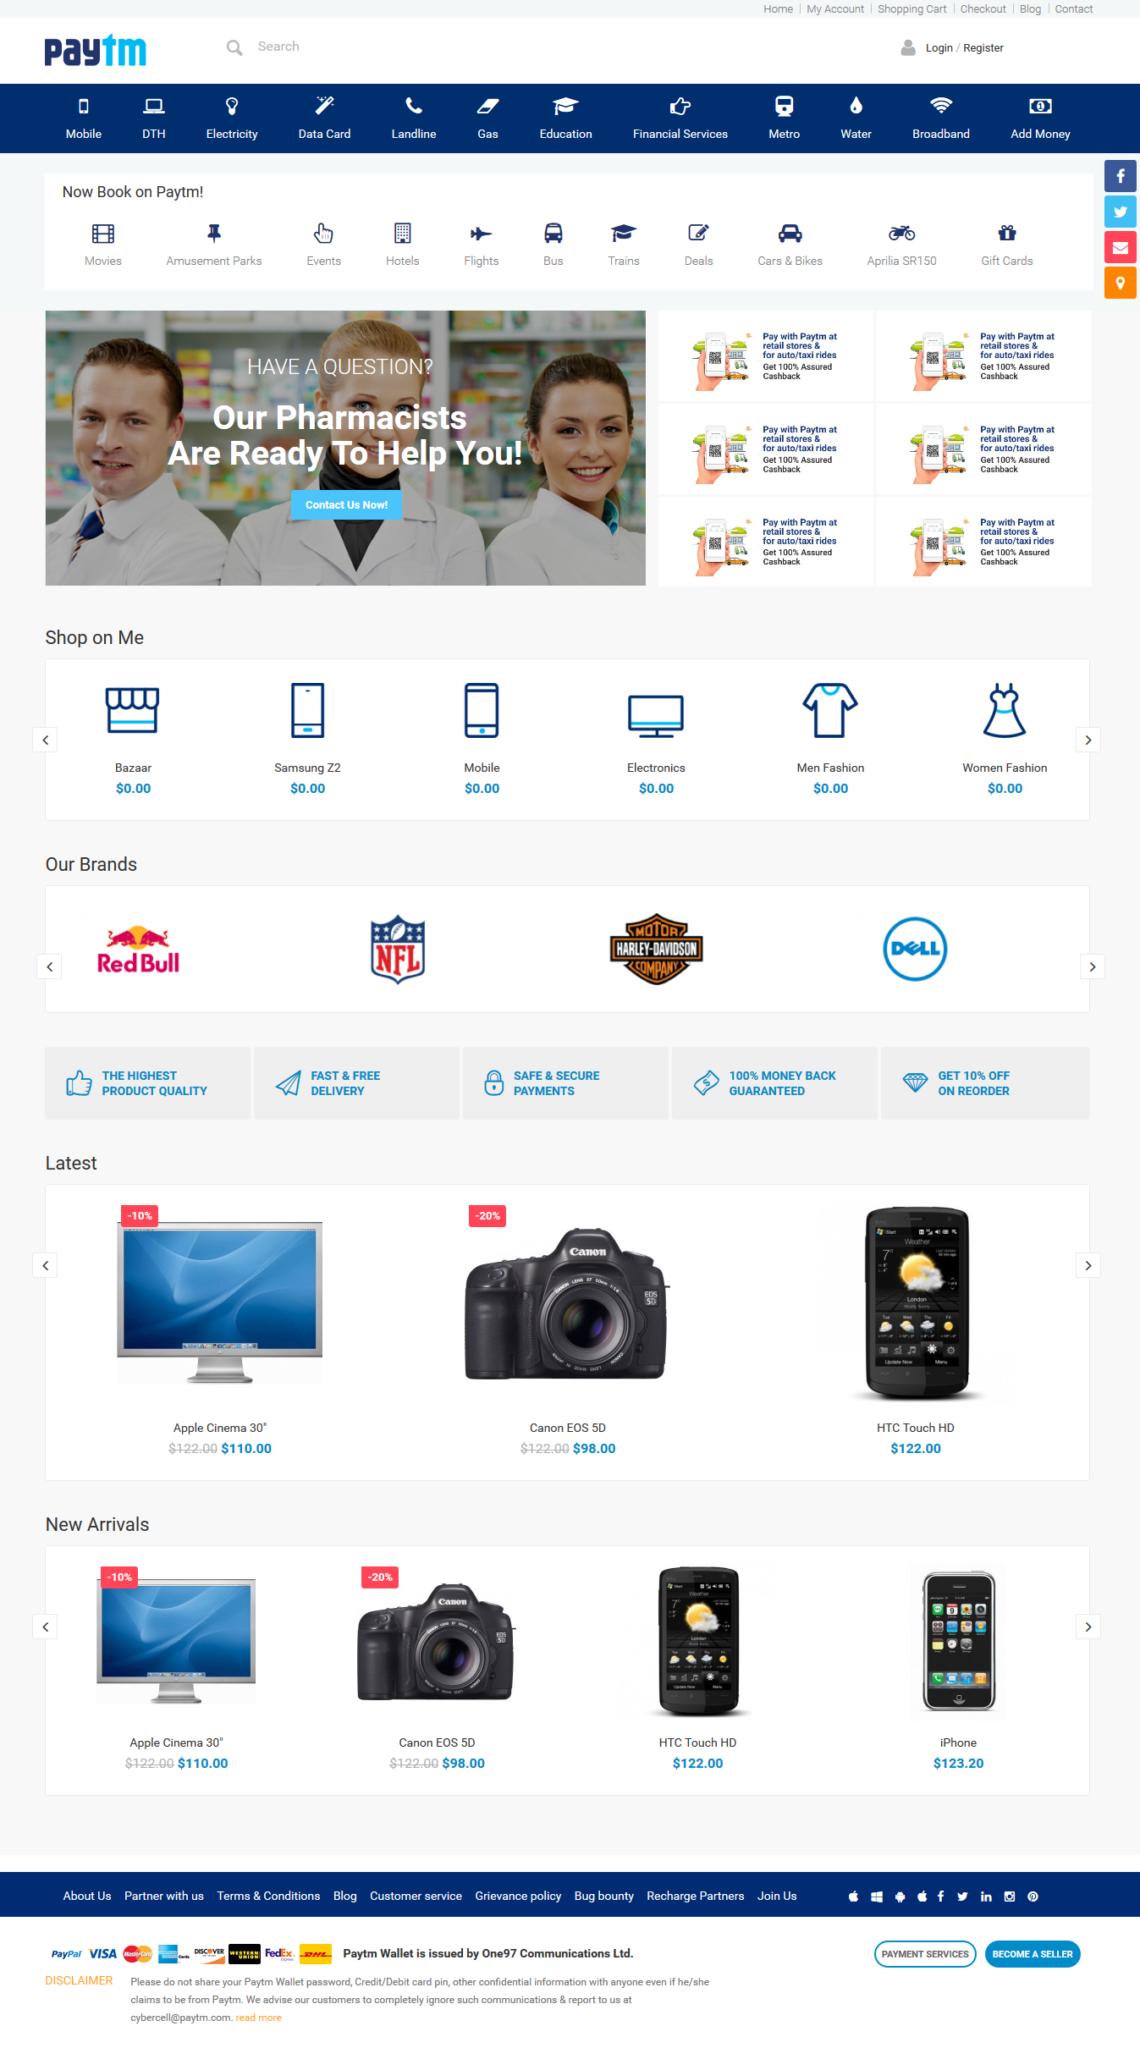 paytm-user-homepage